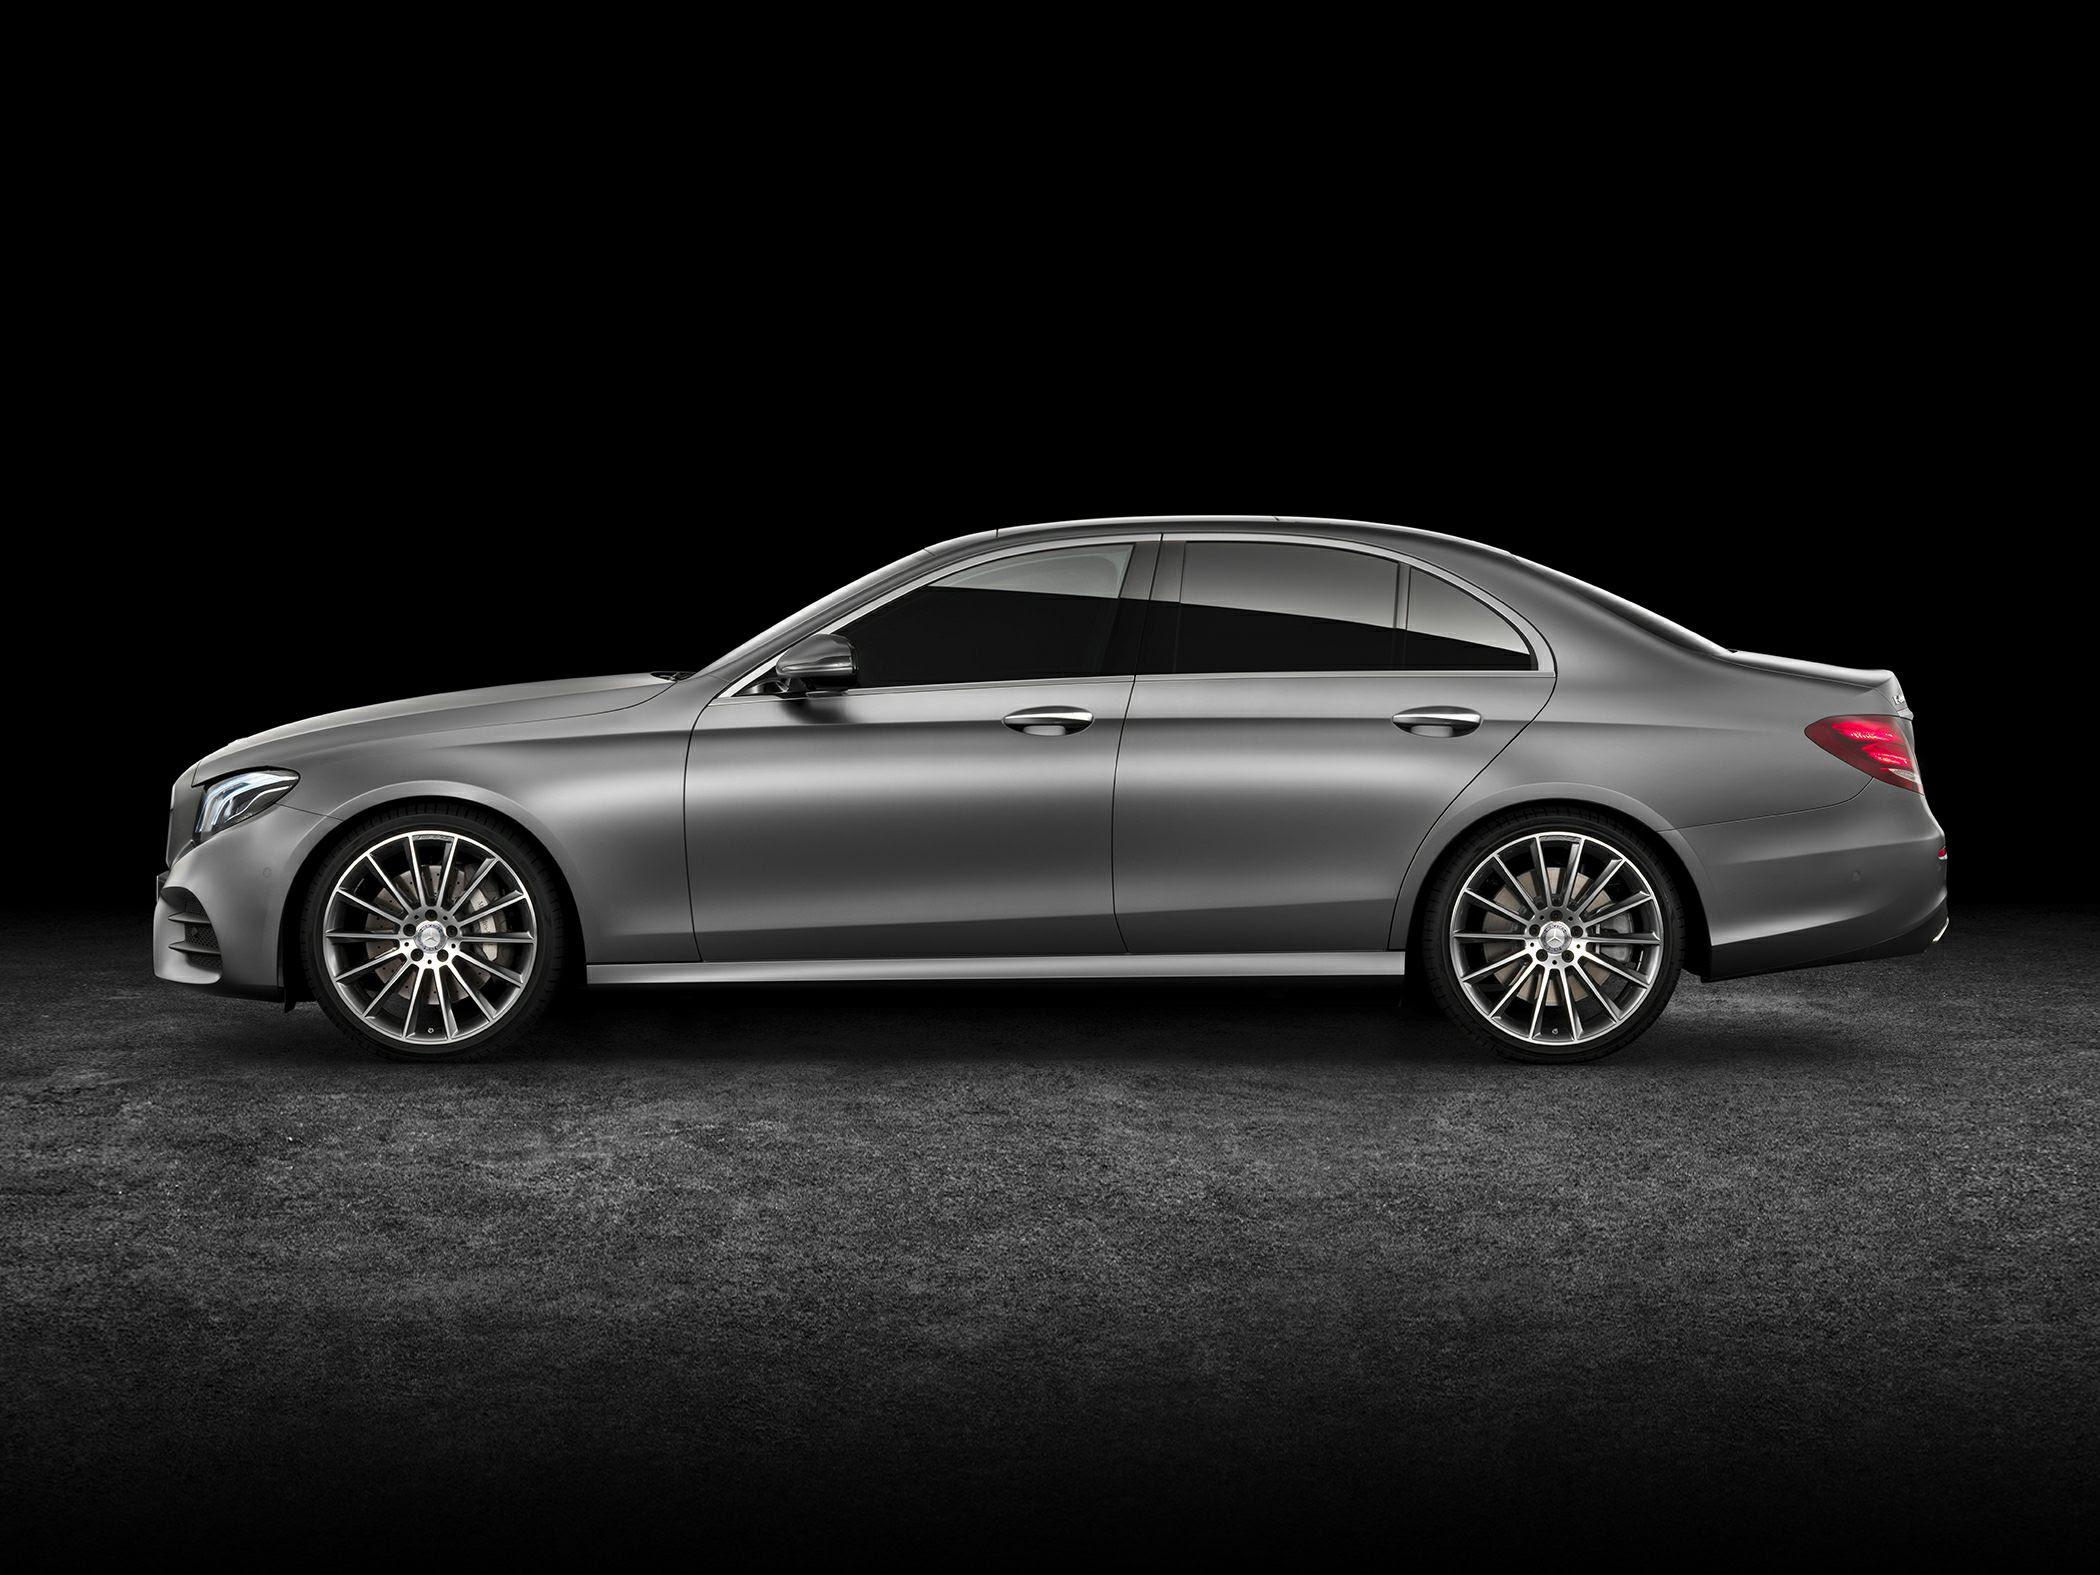 2017 Mercedes-Benz E300 Deals, Prices, Incentives & Leases ...